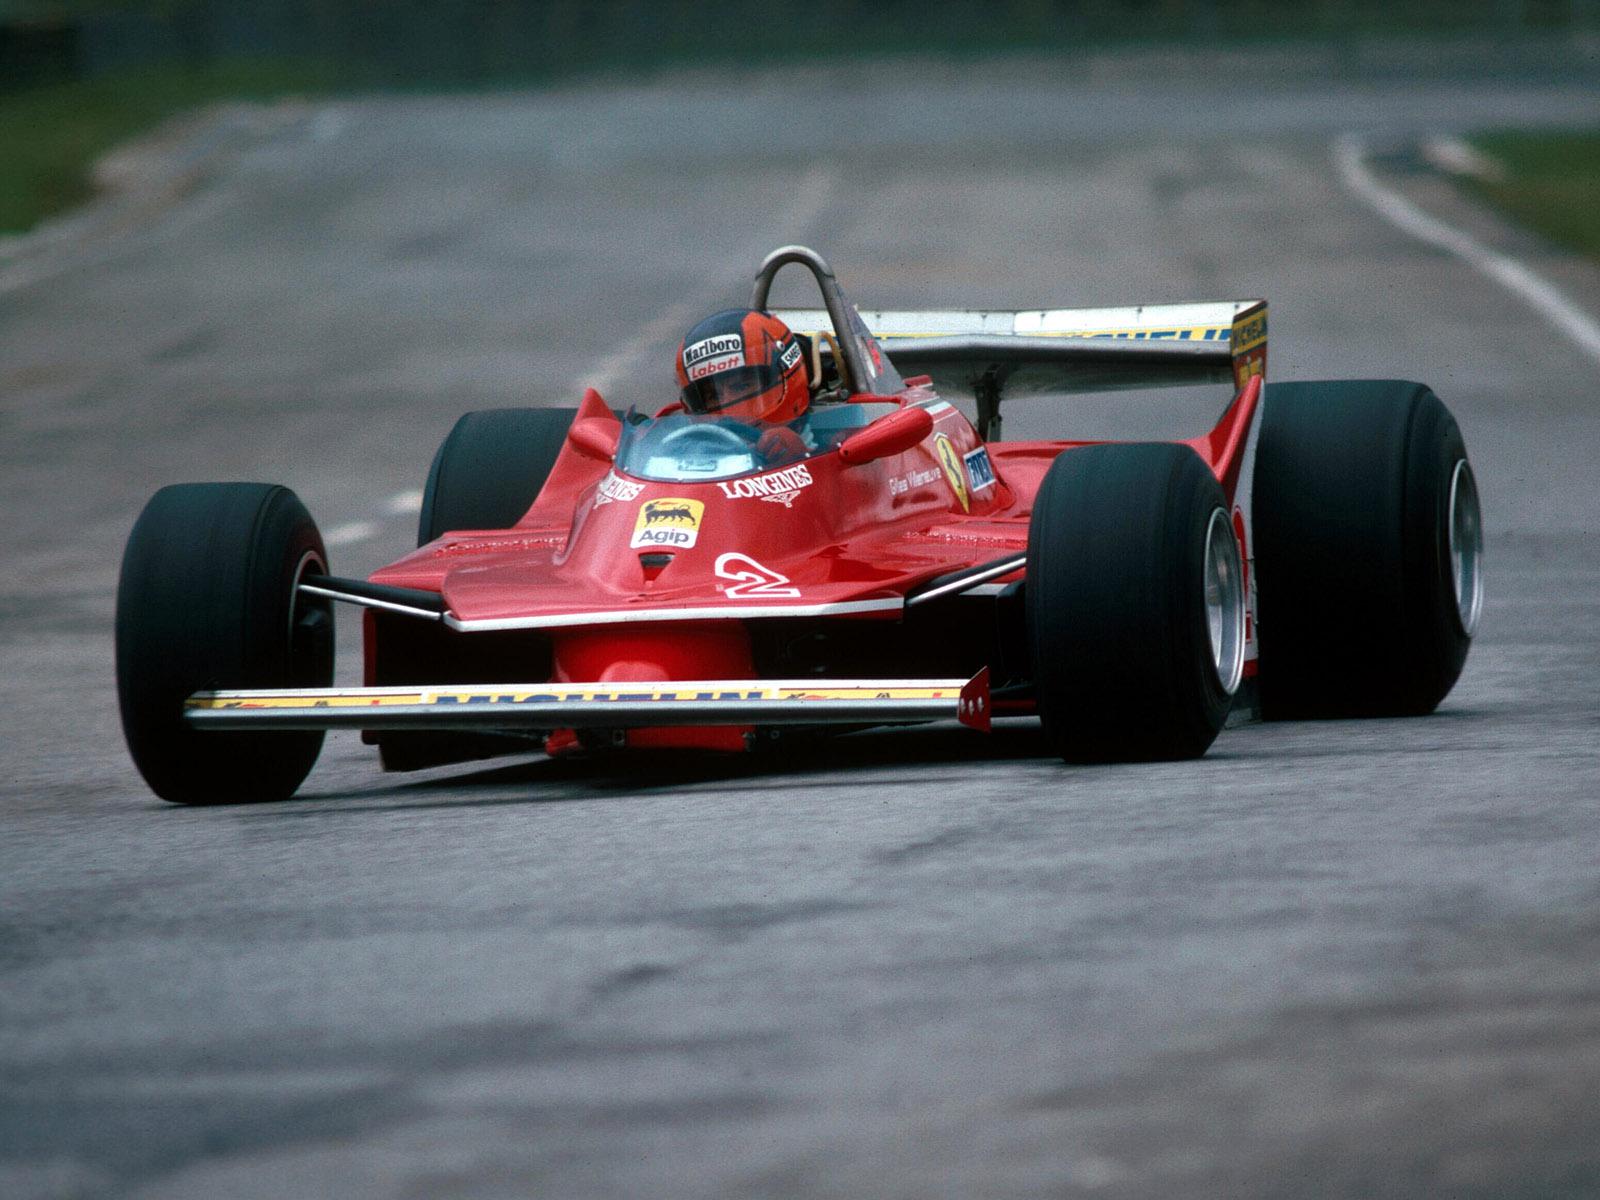 ferrari-f1_312-t5-1980_r5_jpg.jpg